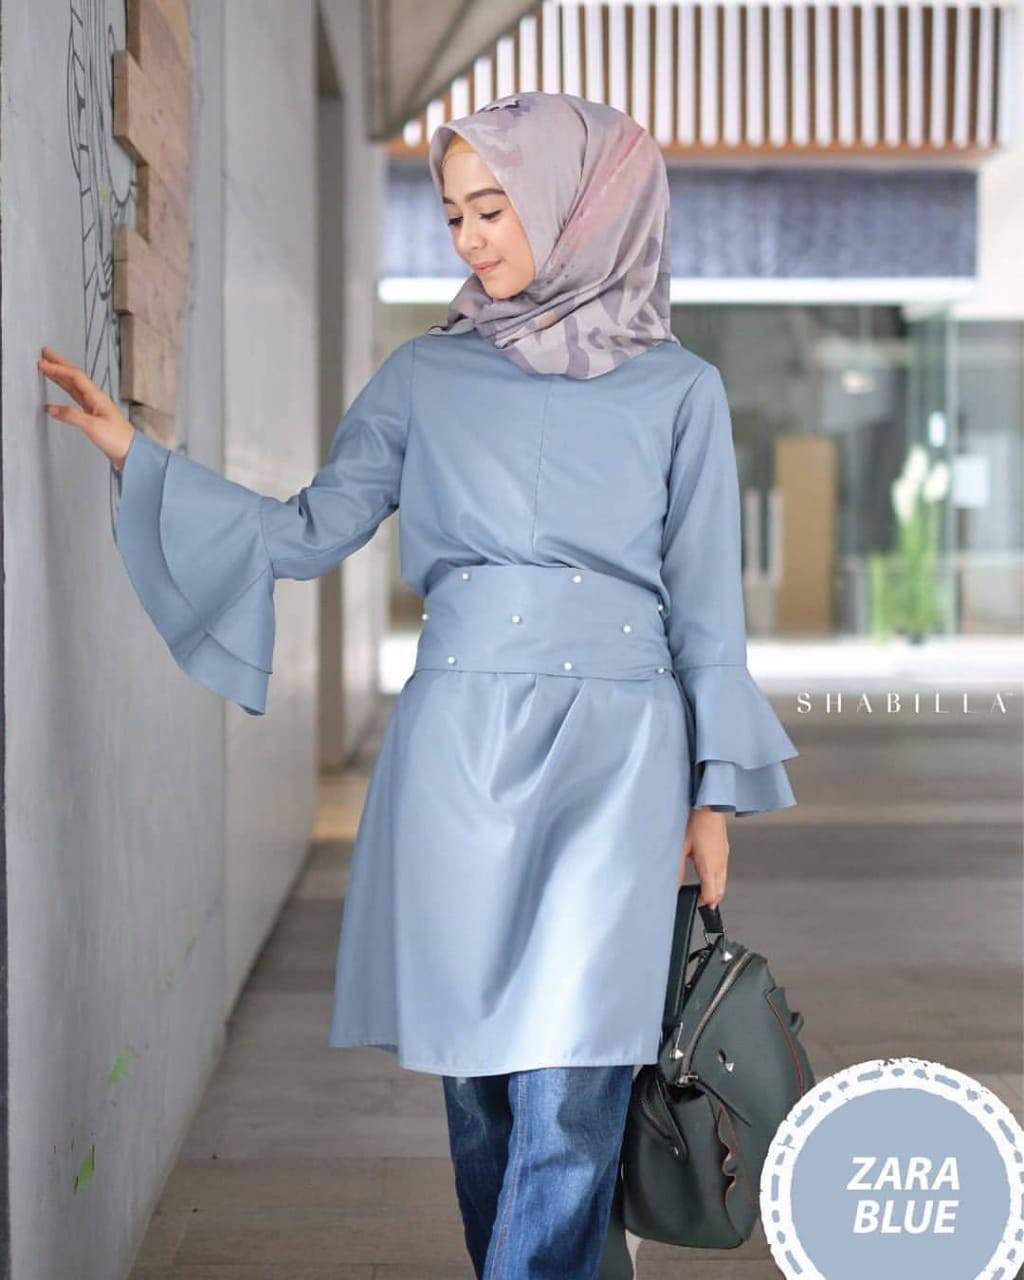 Baju Muslim Original Blouse Zara Tunik Baloteli Tunic Katun Baju Casual Panjang Wanita Atasan Kerja Modis Fashion Hijab Modern Terbaru Pakaian Wanita Trendy